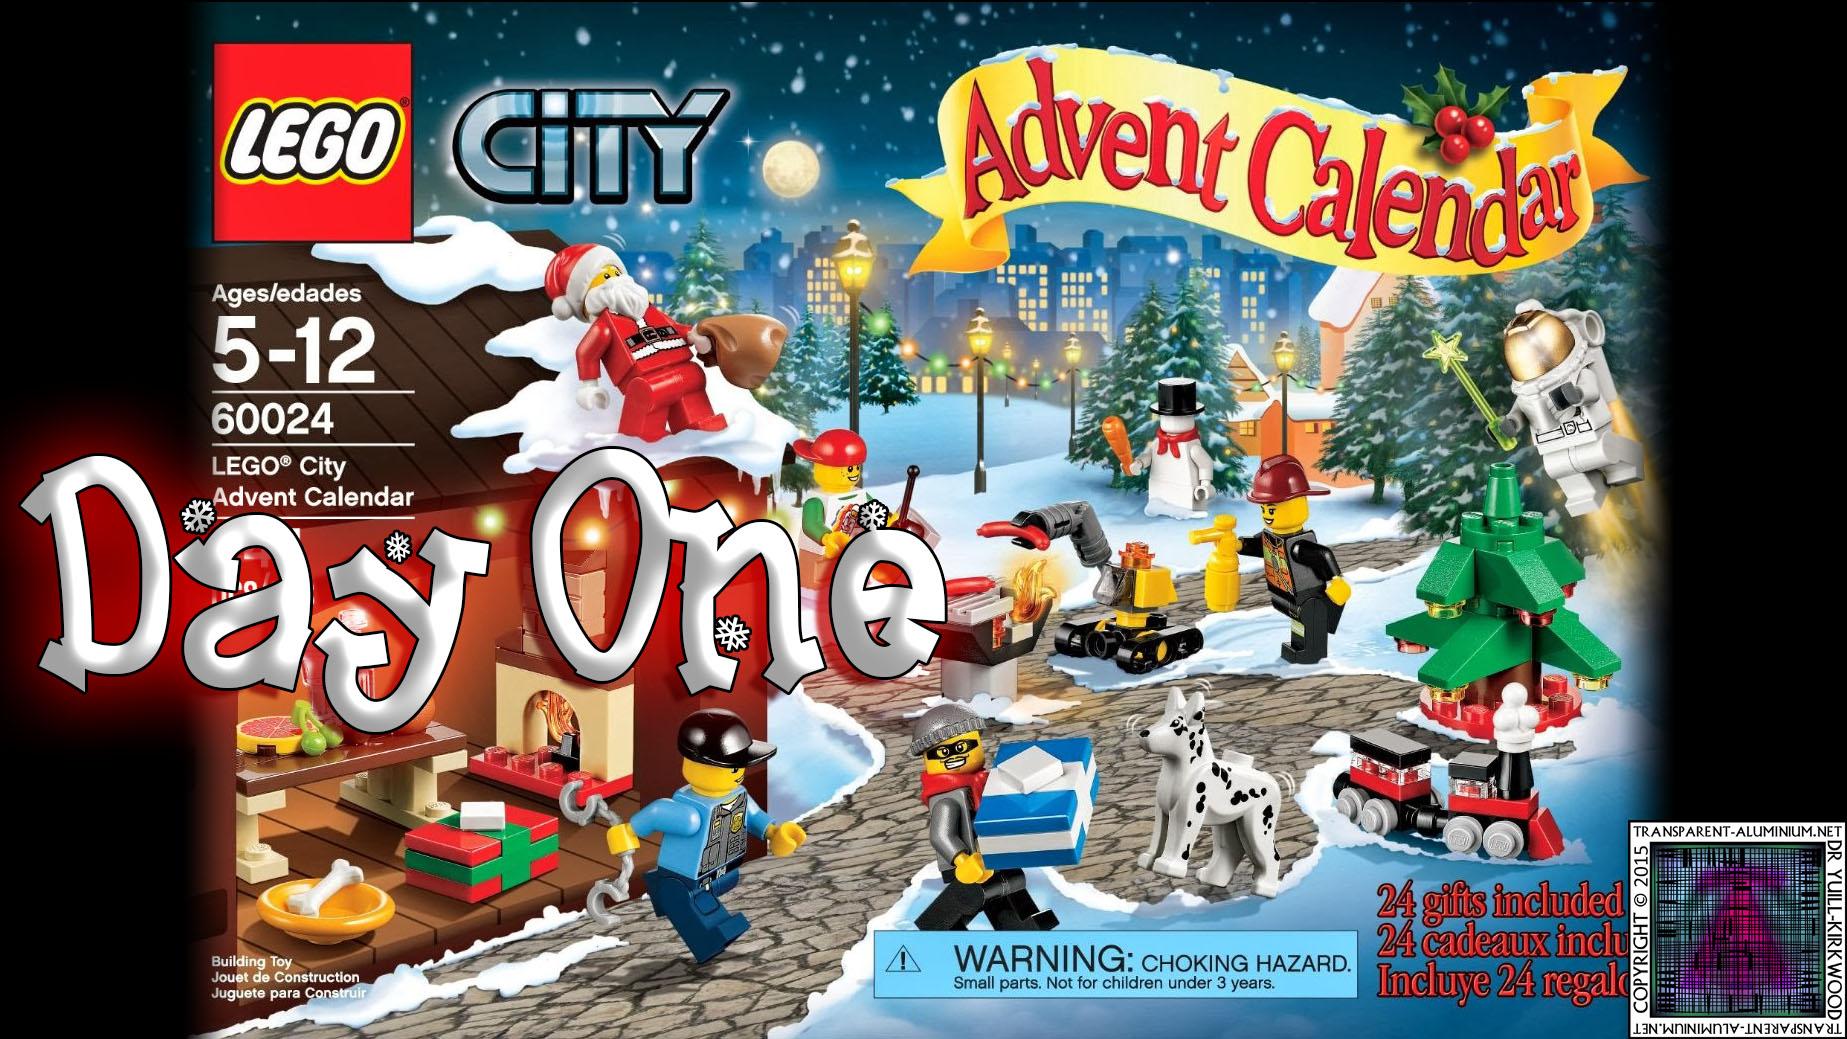 LEGO City Advent Calendar 60024 thumb - Day 01